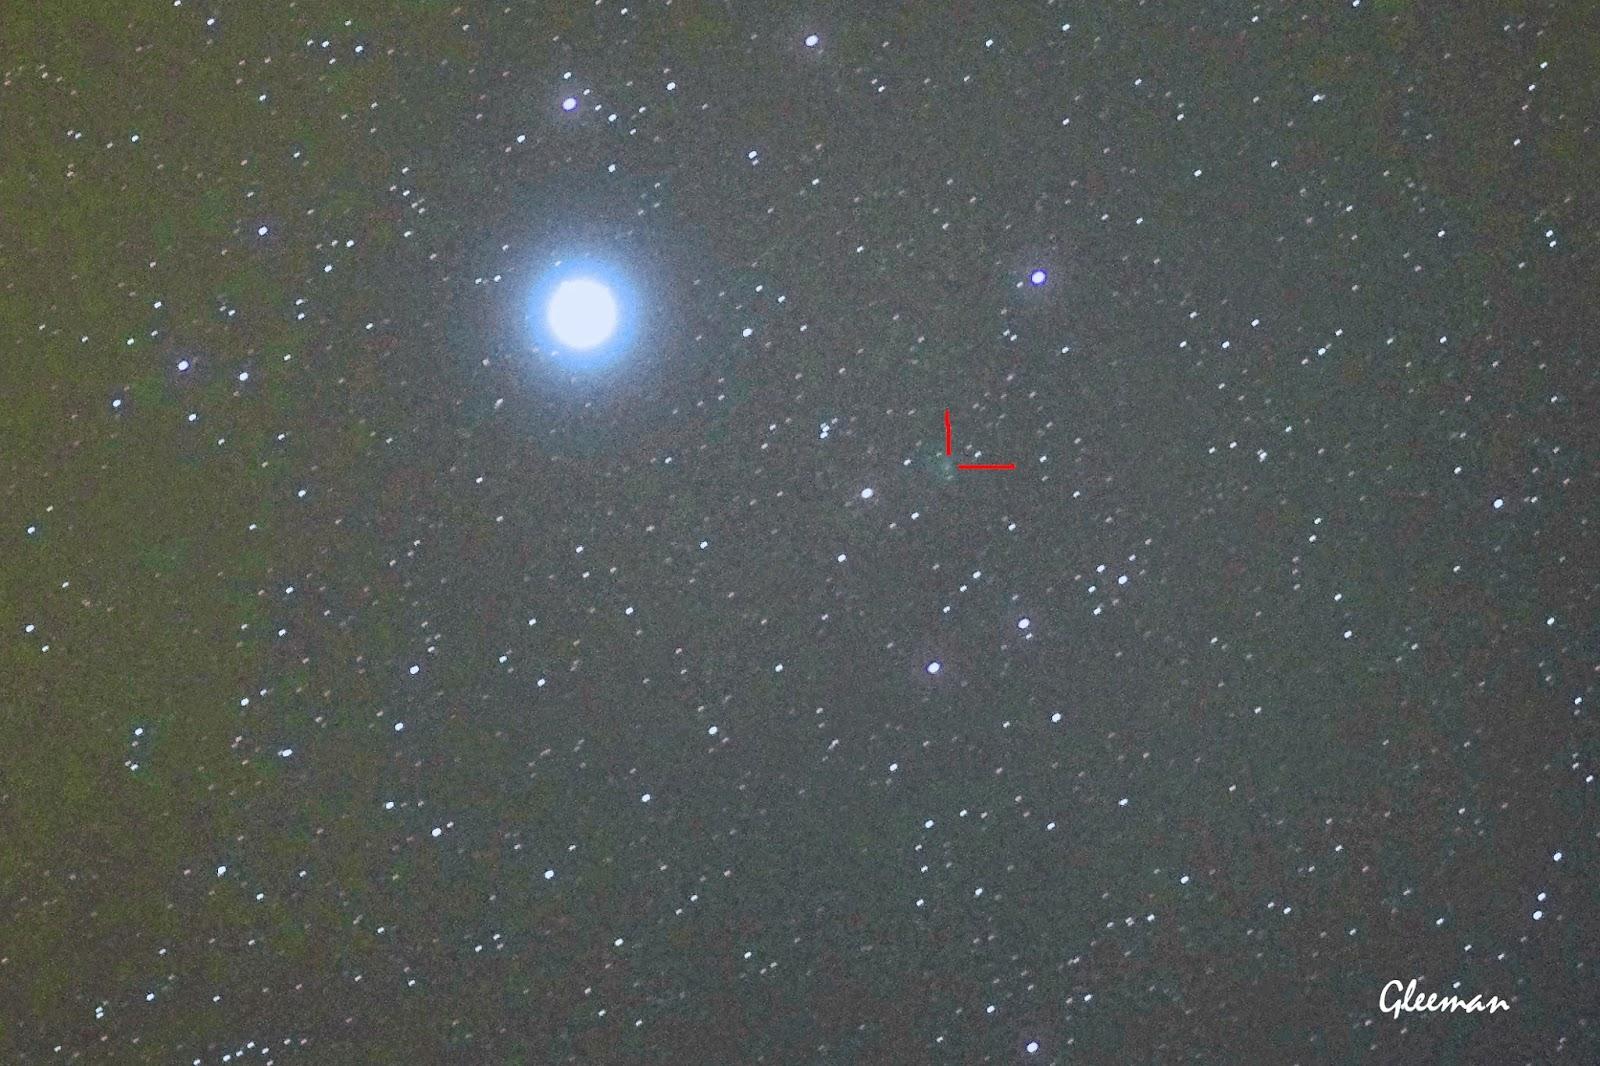 C/2013 UQ4 彗星趴, Pentax K5 + O-GPS1 Astrotracer DA*200 ISO3200 F2.8 單張60s